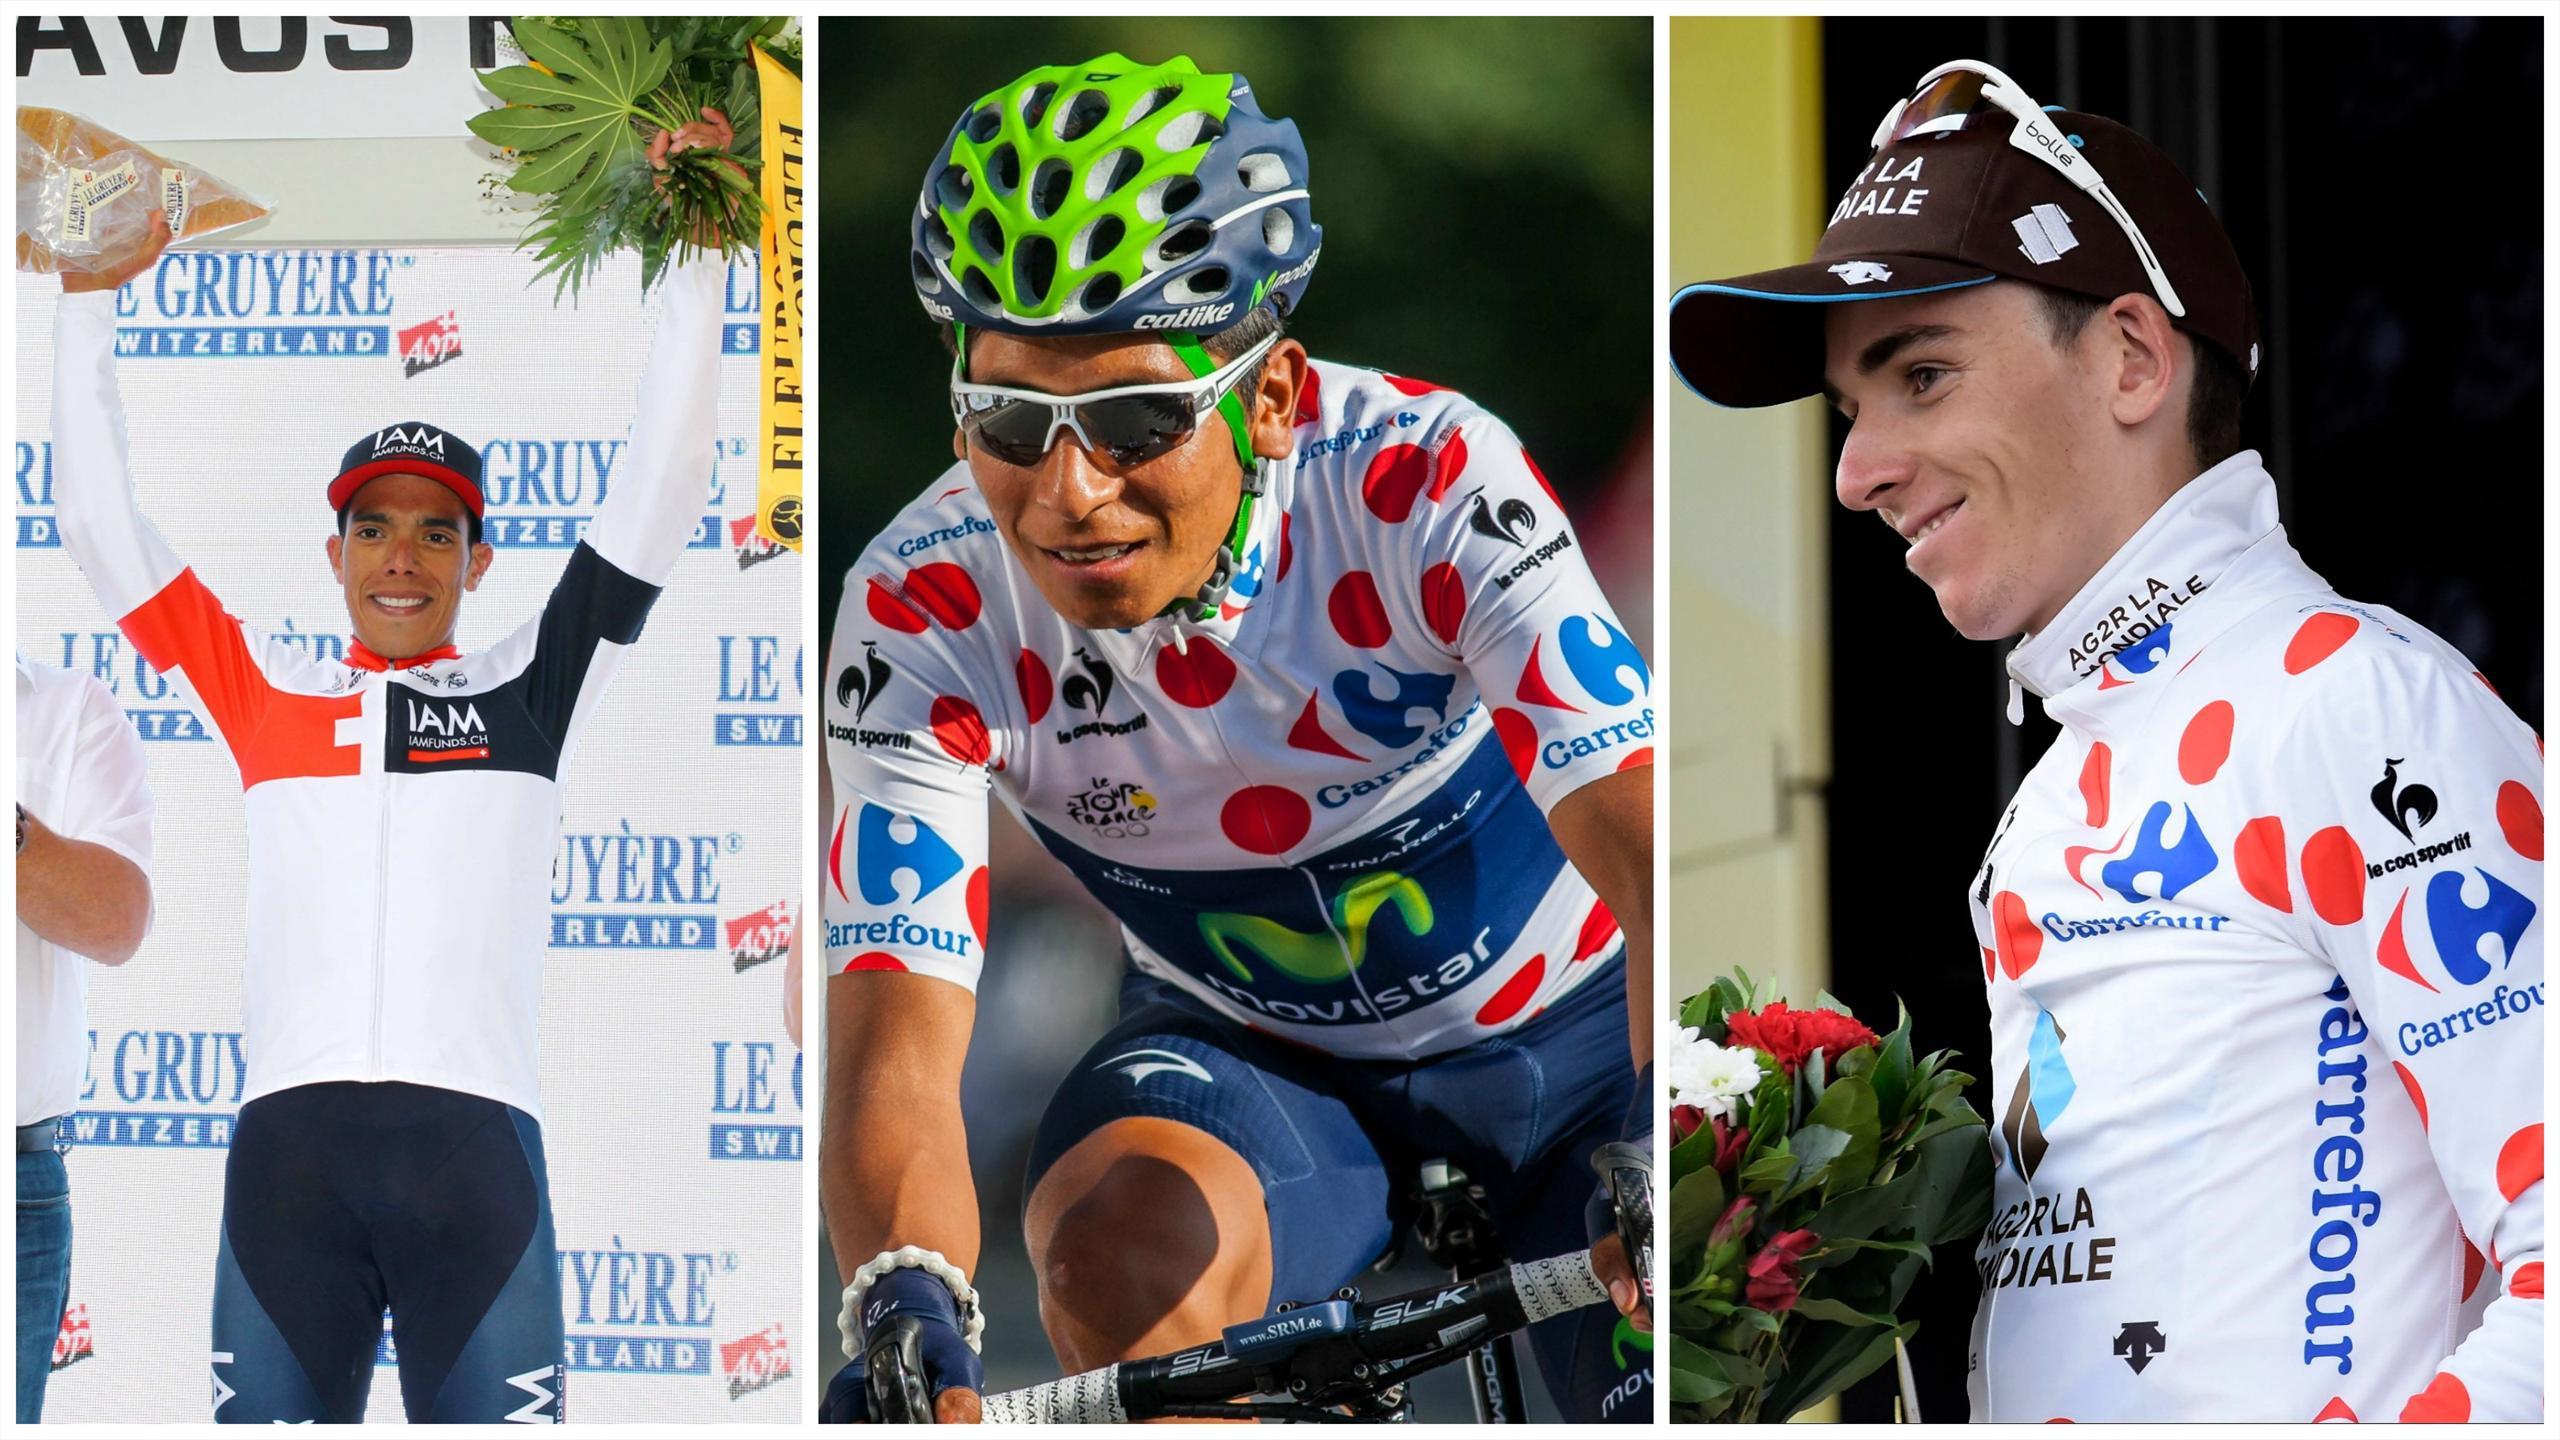 Pantano (IAM), Quintana (Movistar) et Bardet (AG2R La Mondiale)